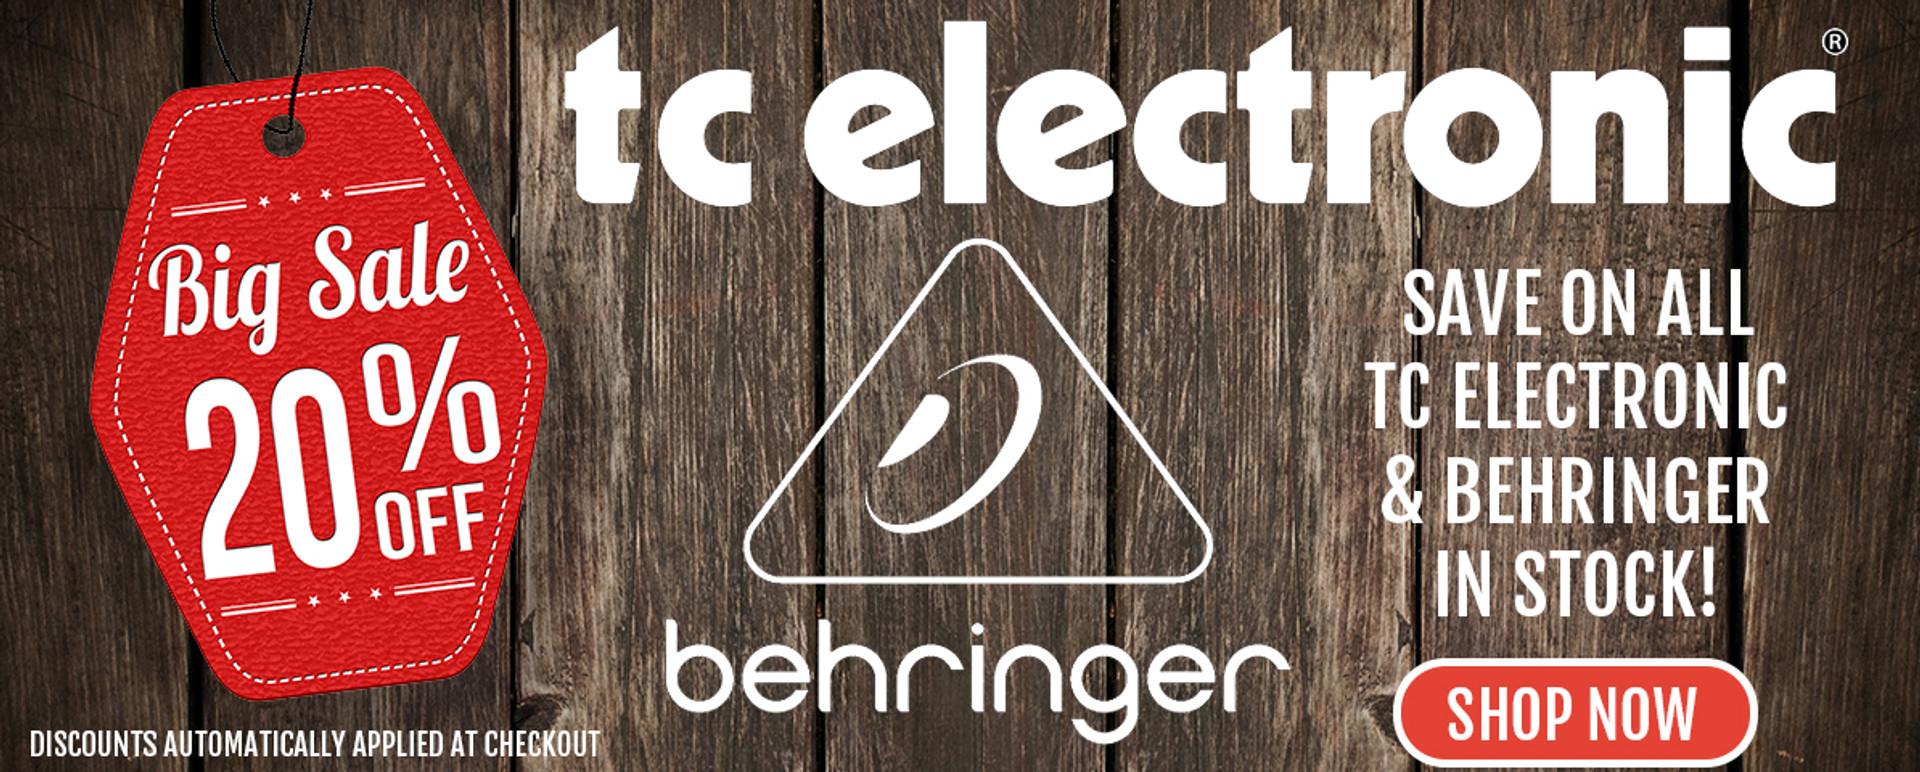 TC ELECTRONIC BEHRINGER